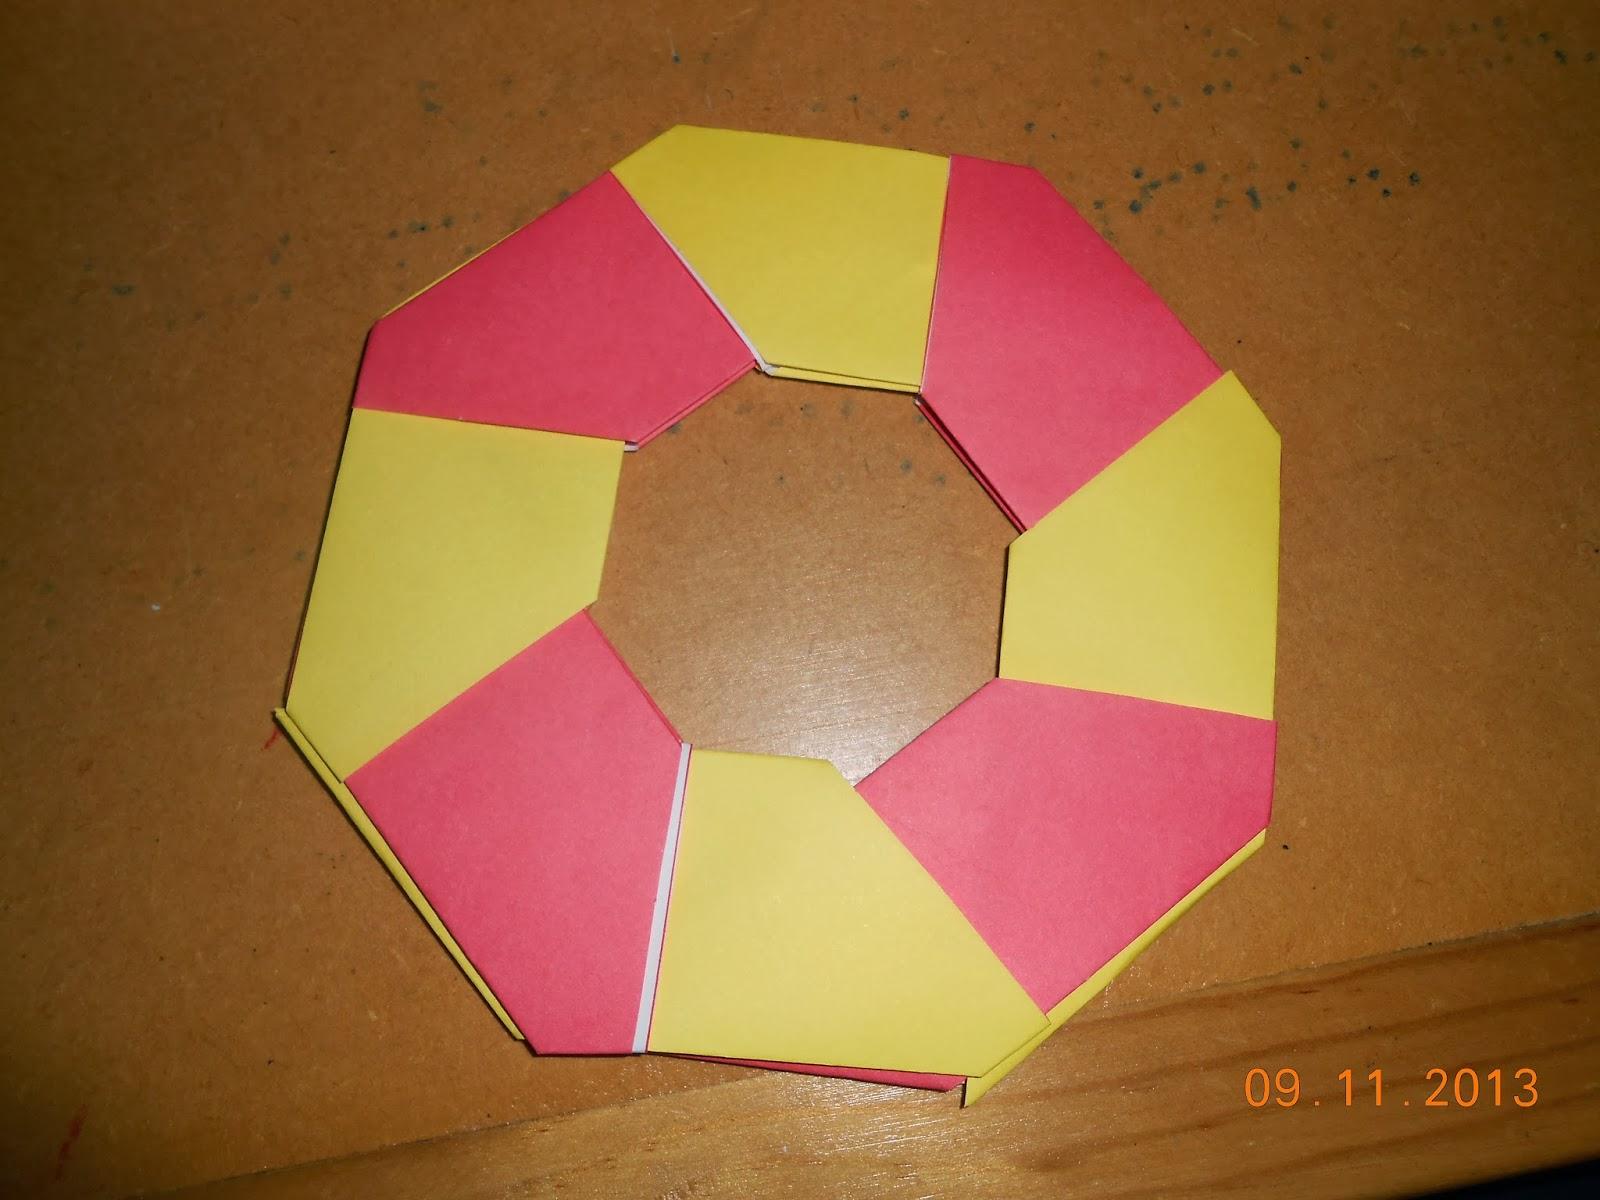 Val di estrella ninja mgica origami shuriken origami transformer estrella ninja mgica jeuxipadfo Images